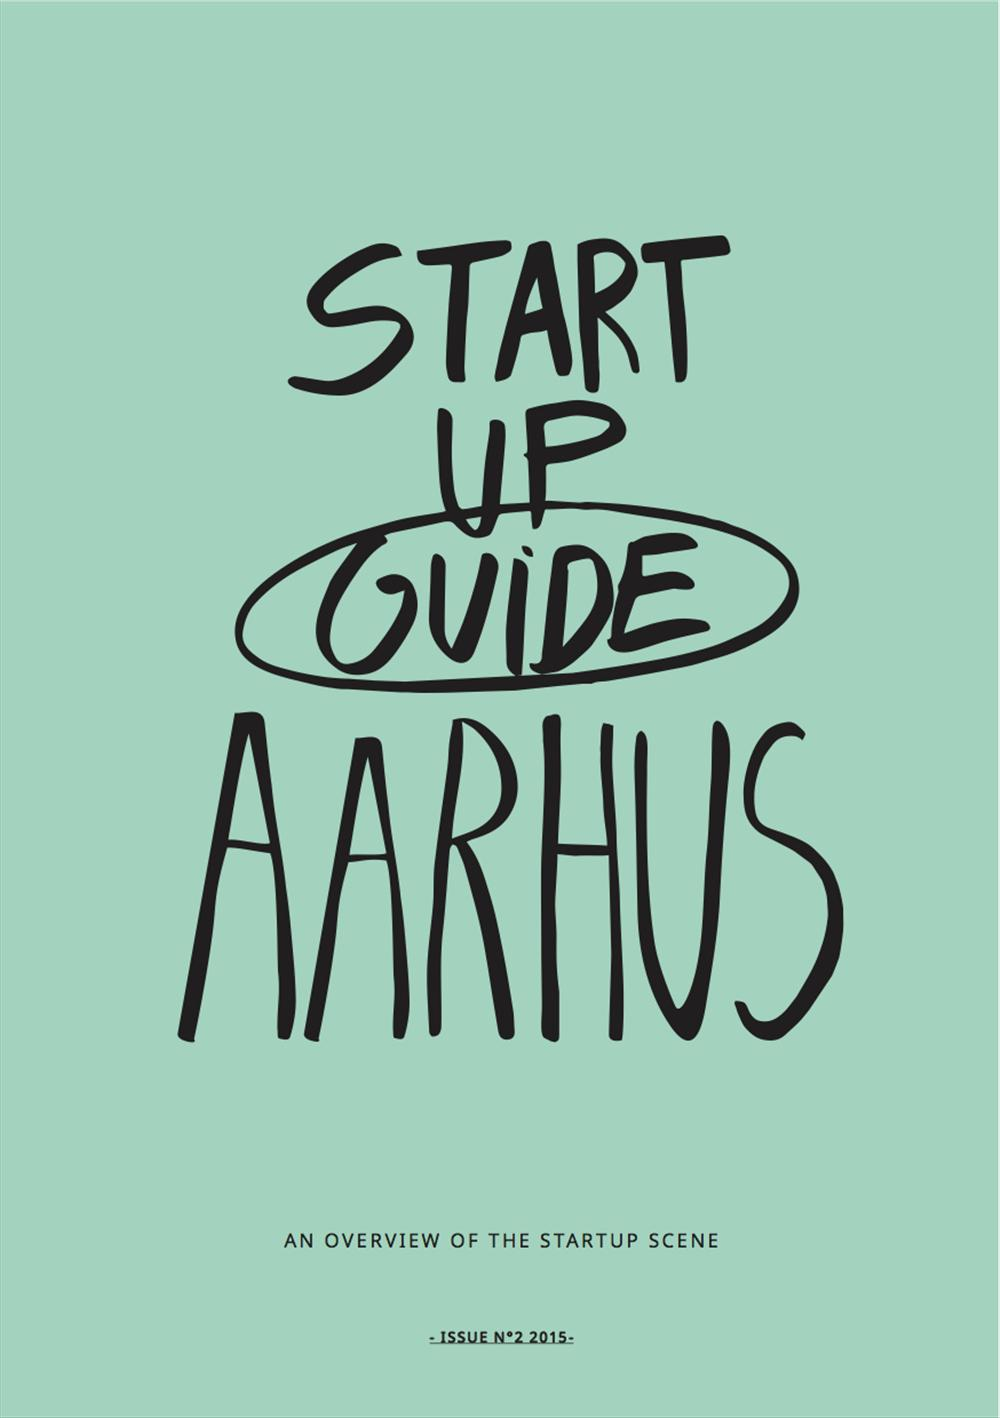 Start up guide Aarhus